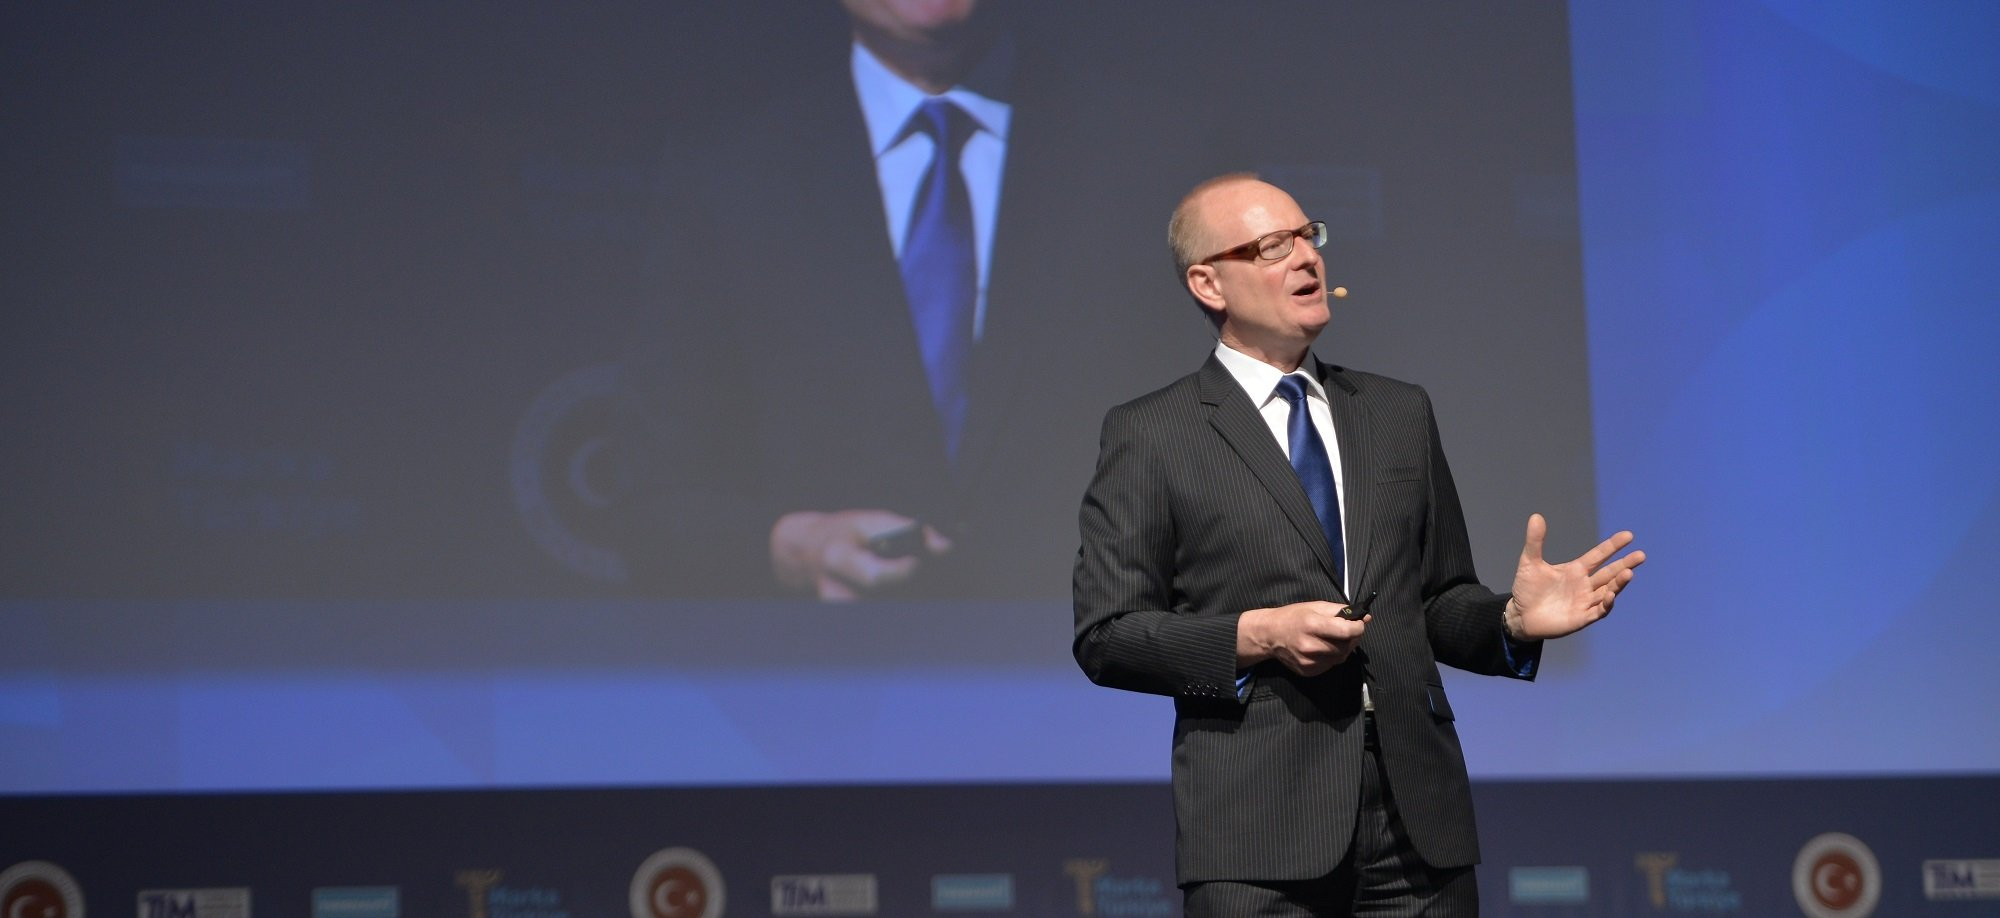 Martin Roll as Keynote Speaker at The INSEAD Global Luxury Forum 2018